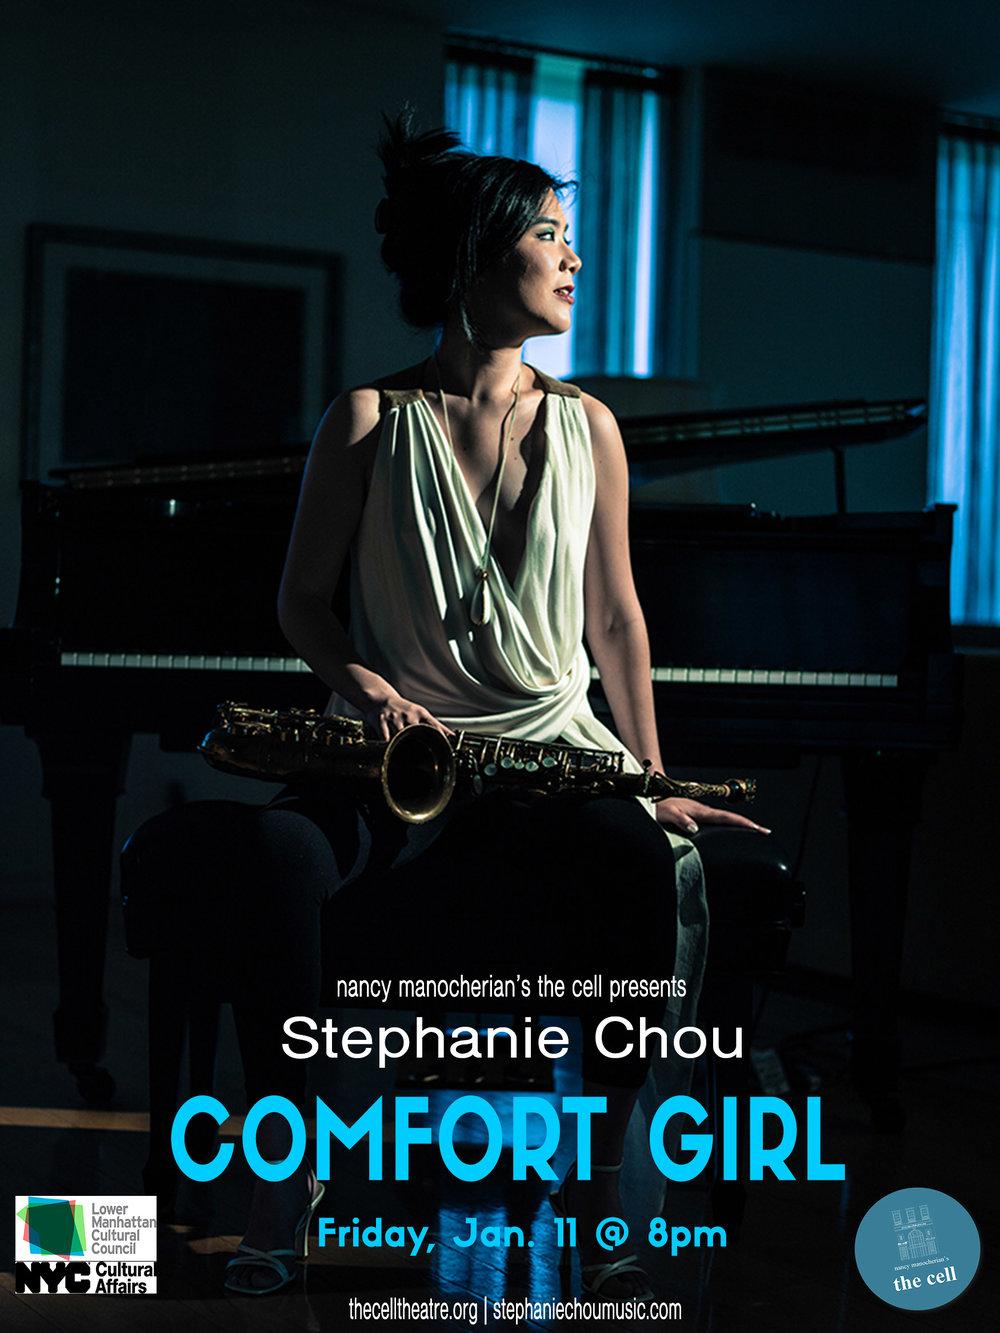 comfort girl WEB2.jpg